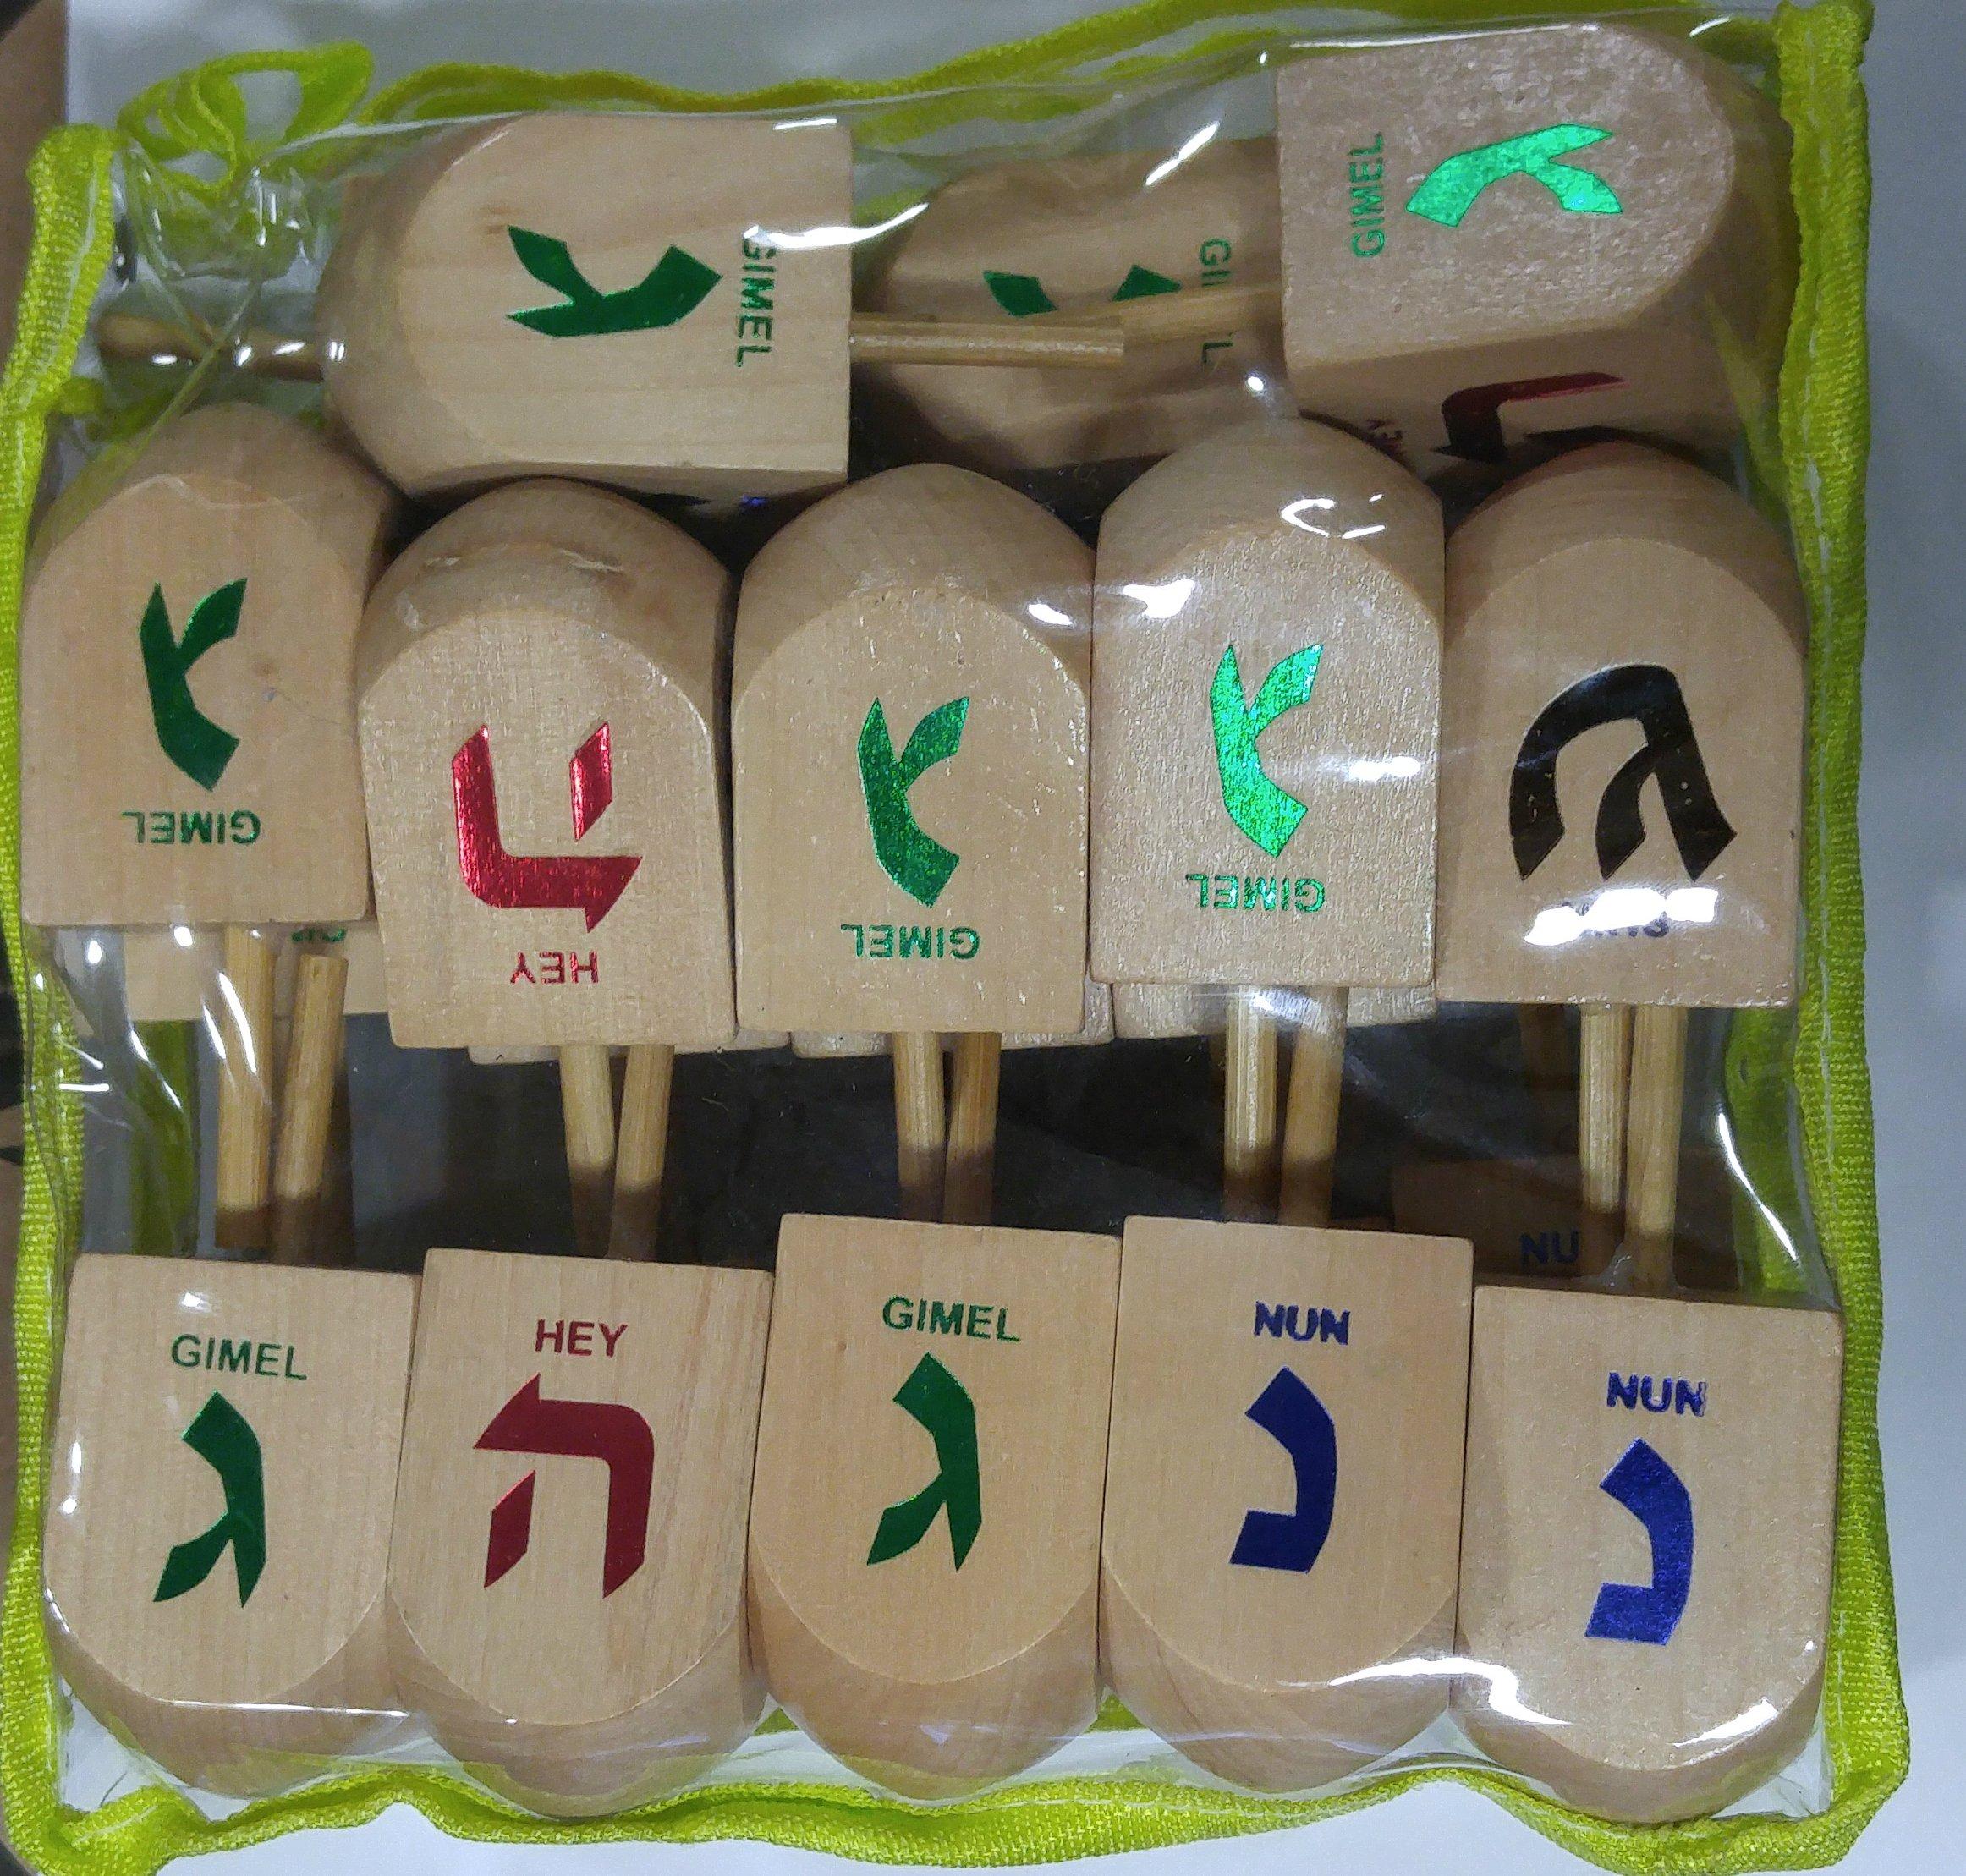 Jerusalem Dreidel Wood Dreidels Large Sized With English translation in Bulk Pack of 24 Pieces in Zippered Bag